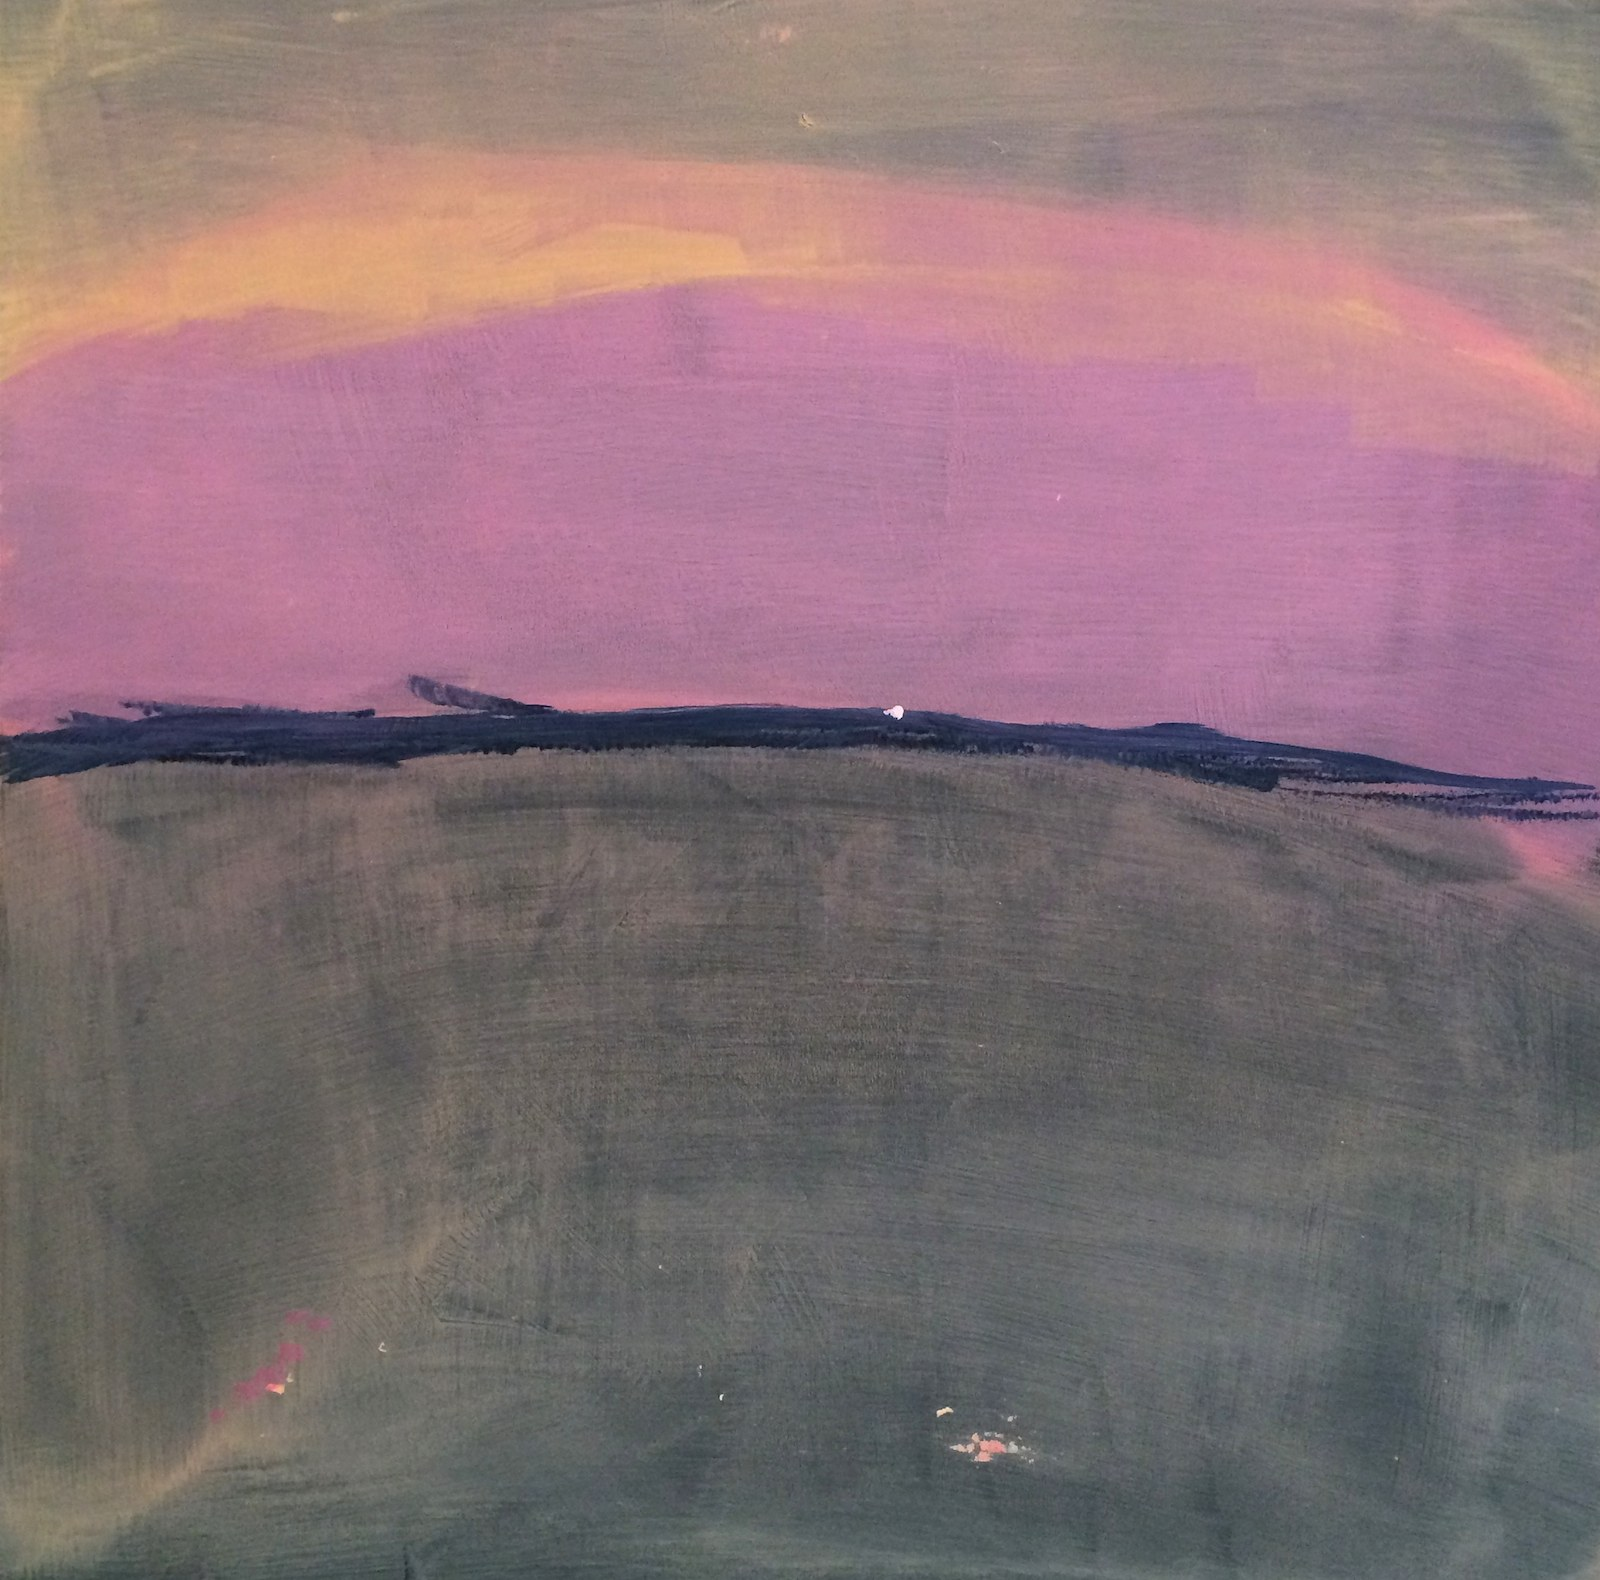 How time feels ( sourdine), 40 x 40 cm, 2015, Jane Hughes